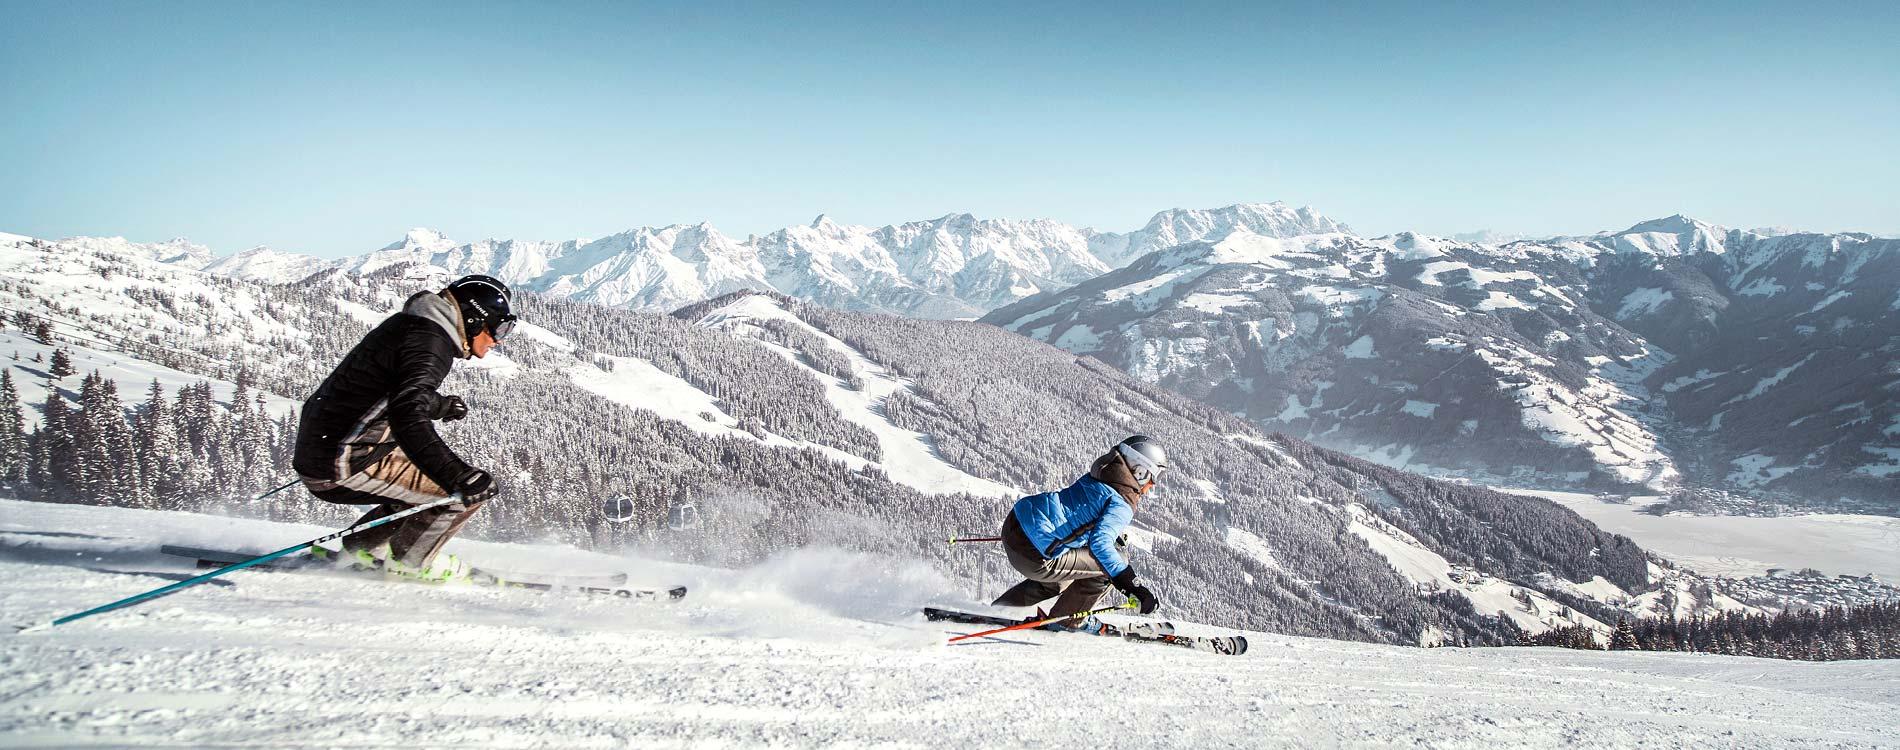 Skiing SalzburgerLand